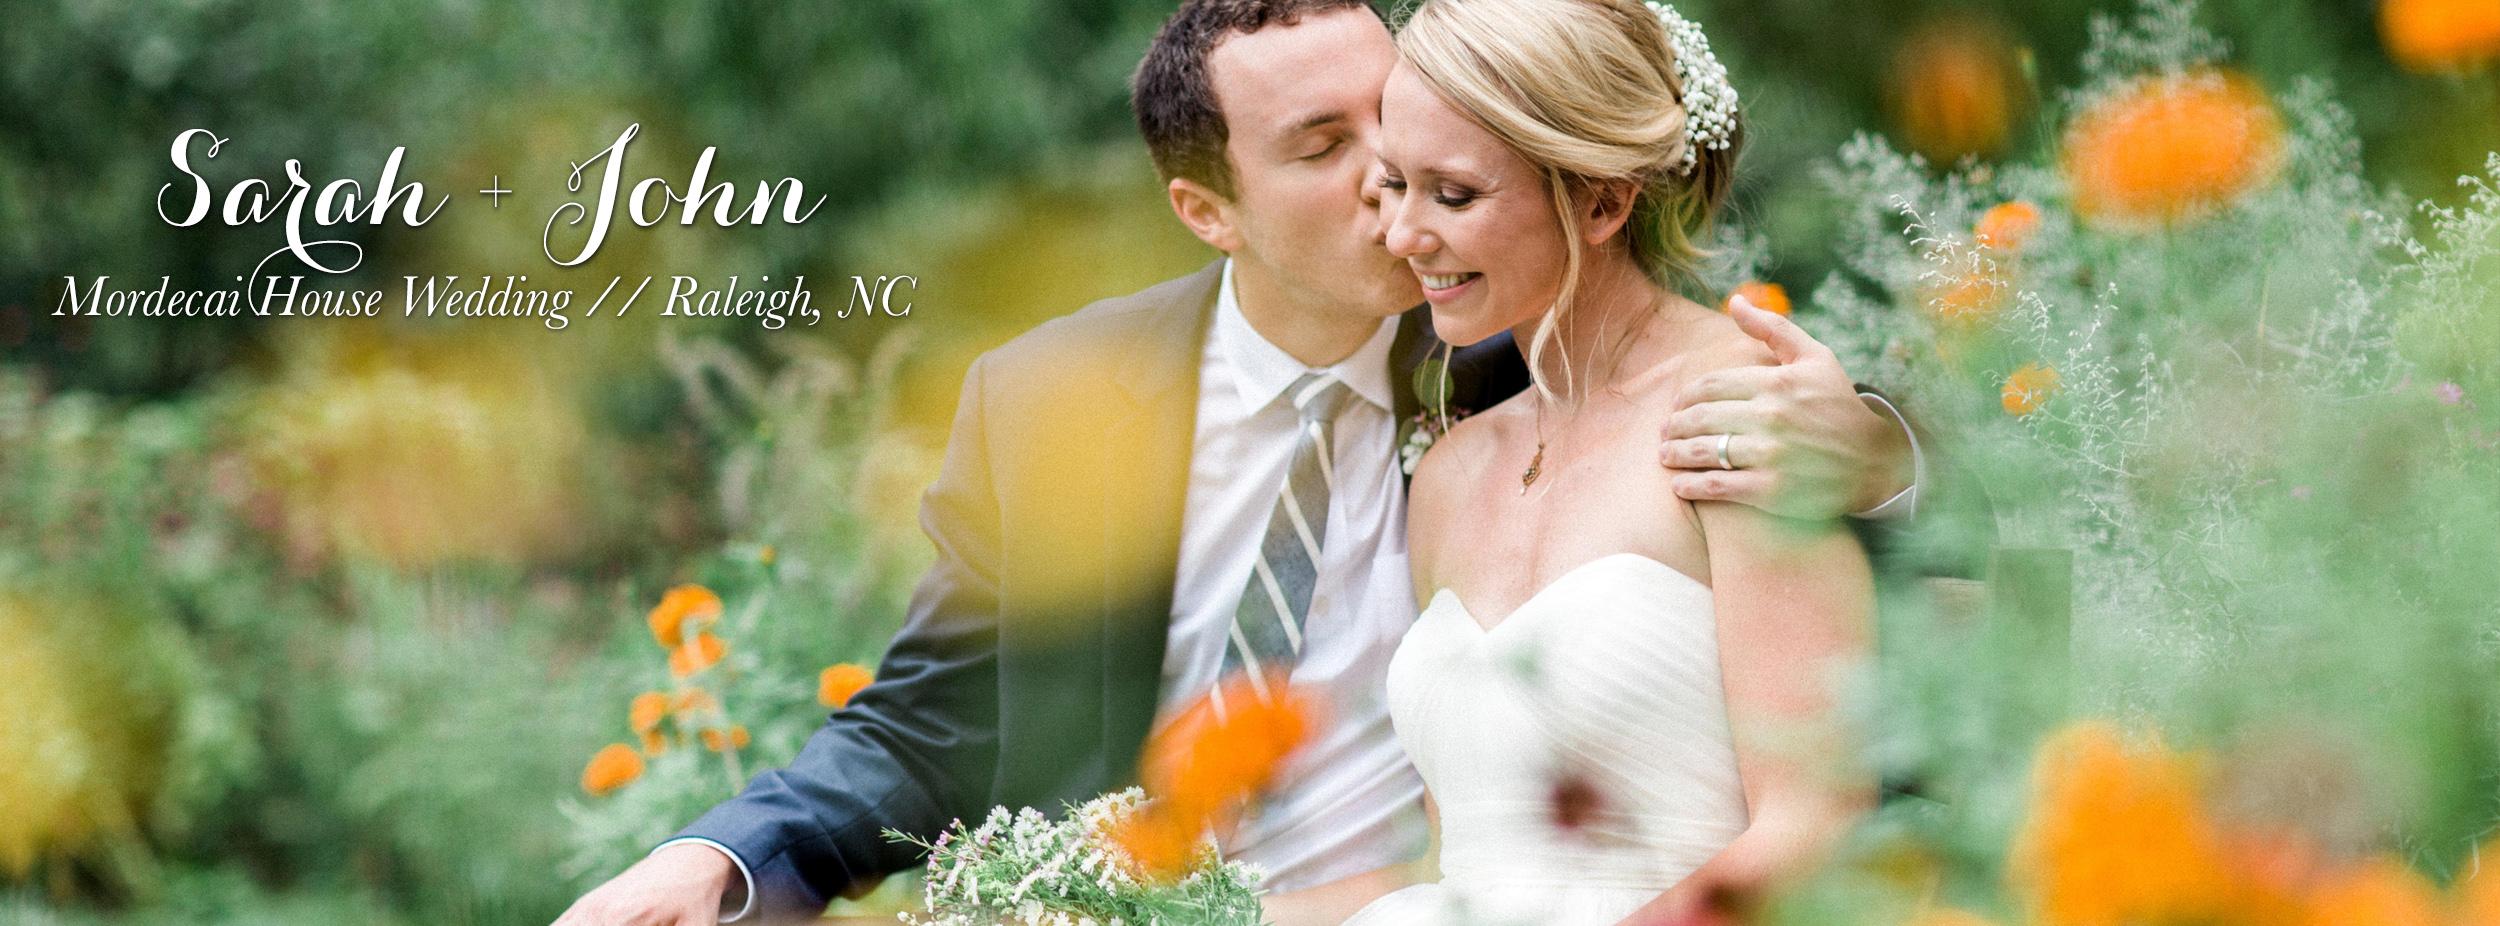 North Carolina Wedding Photography, Romantic, Elegant, Natural, Fine Art, Fayetteville, Raleigh, Durham, Greensboro, Jacksonville, Wilmington, Asheville, Spring Lake, Fort Bragg, Professional,  Savannah, Georgia